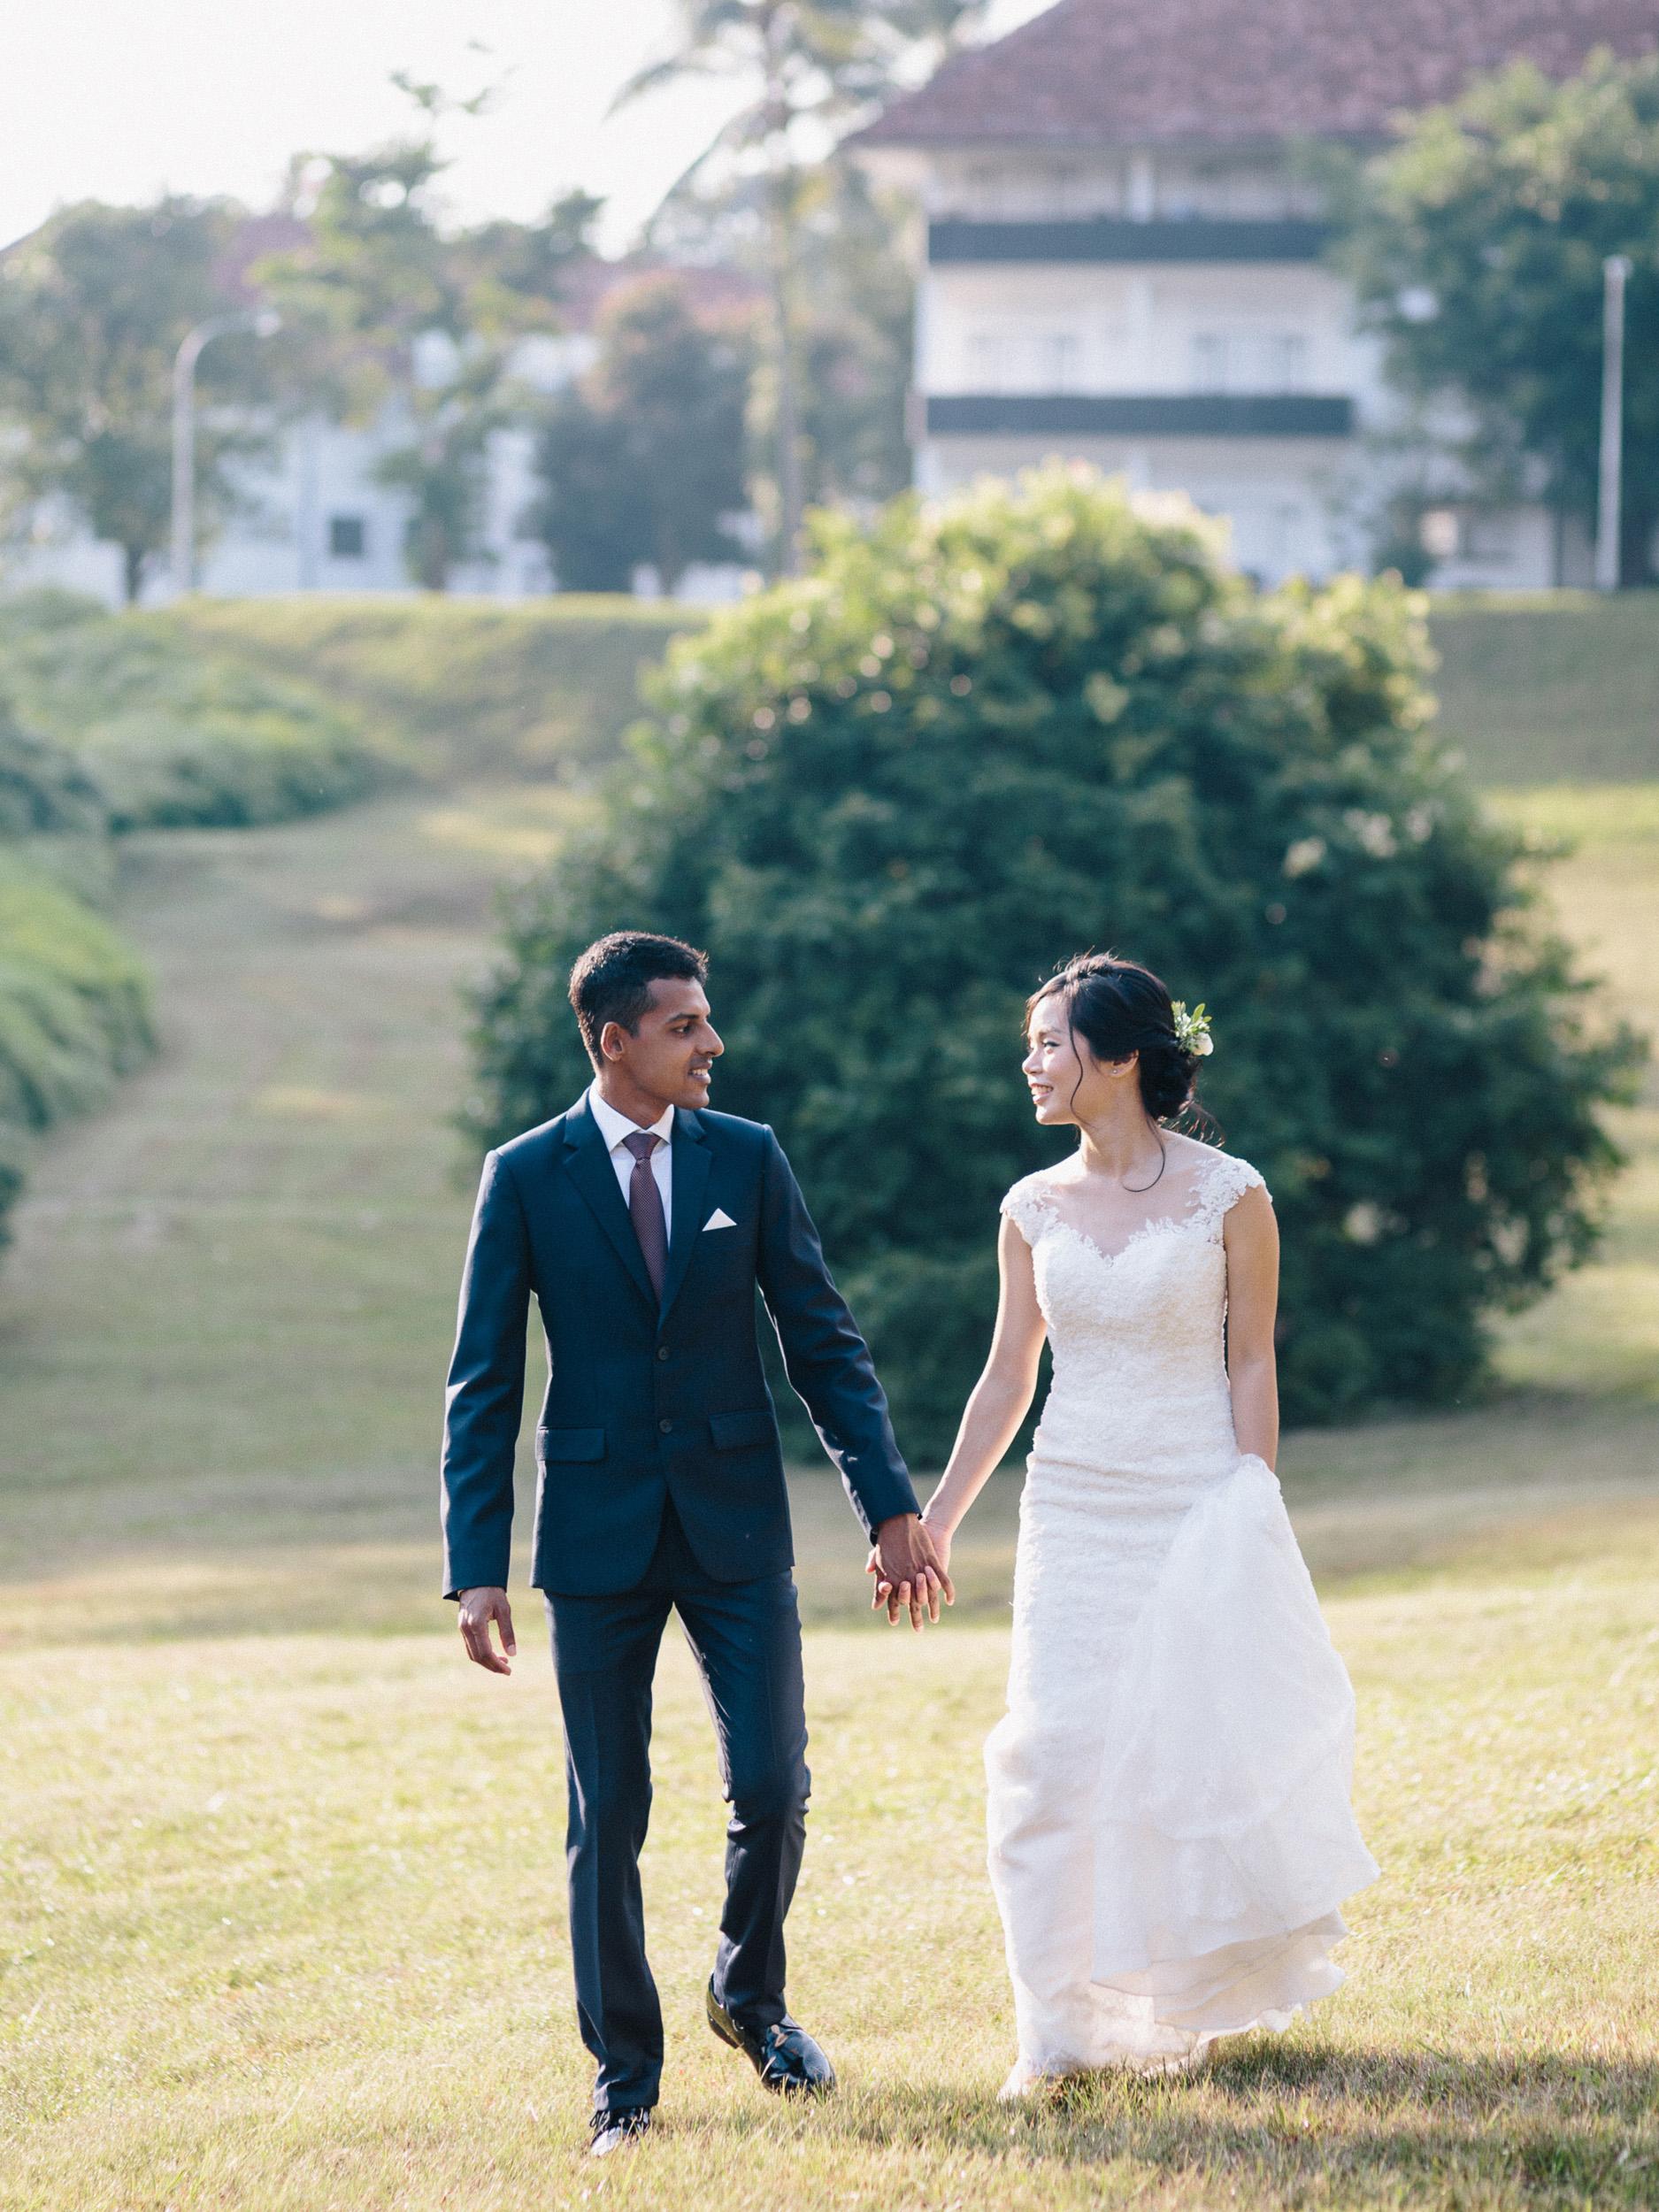 singapore-wedding-photographer-photography-wmt2017-133.jpg